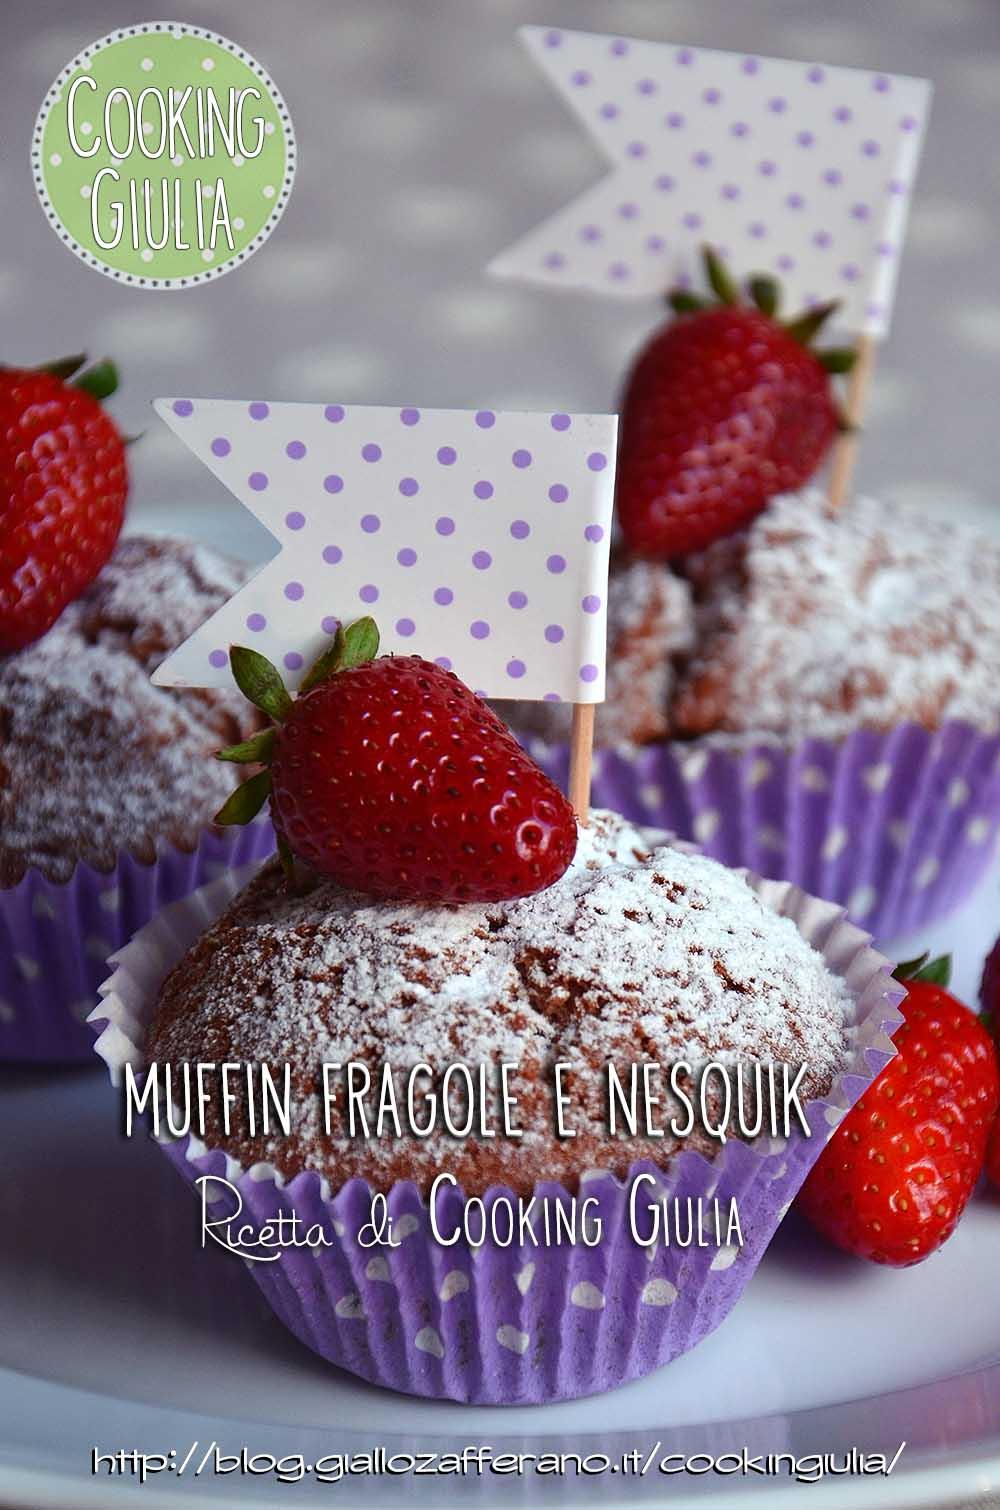 muffin nesquik | muffin | fragole | pois | nesquik | cooking giulia | stampini carta muffin | pirottini pois